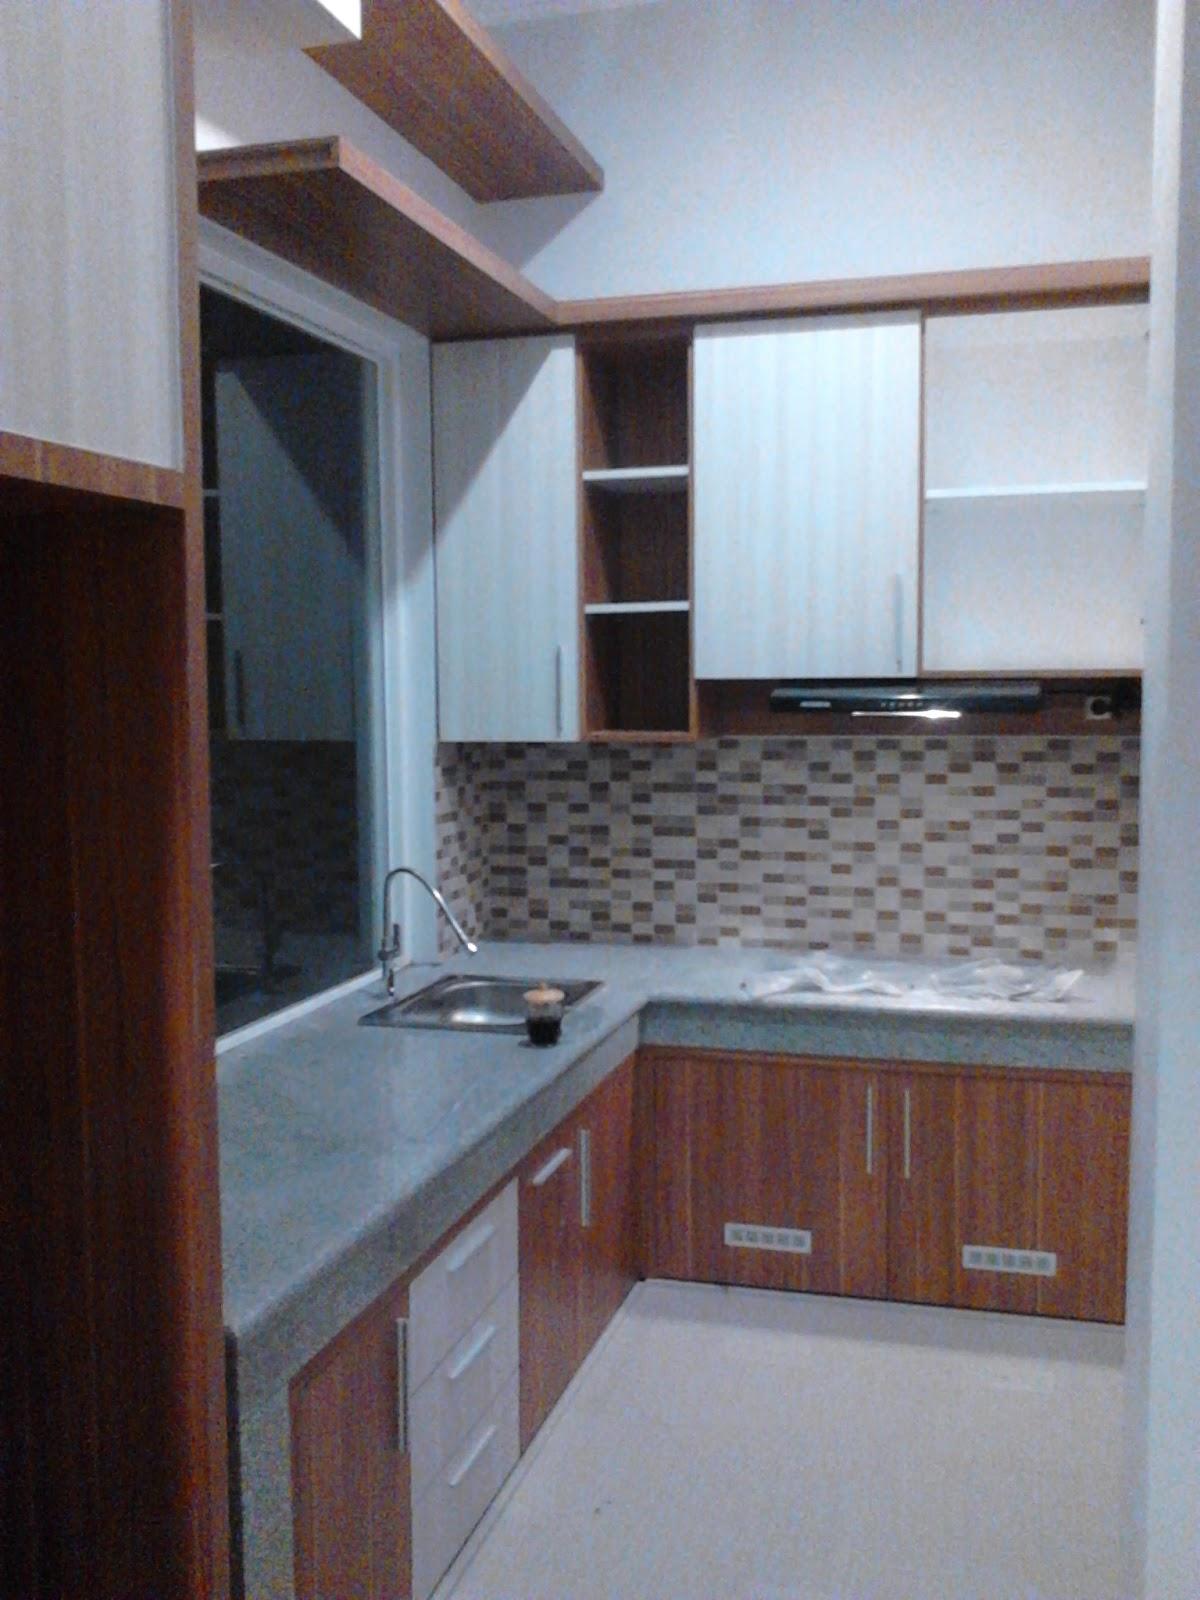 Solo Kitchen Set